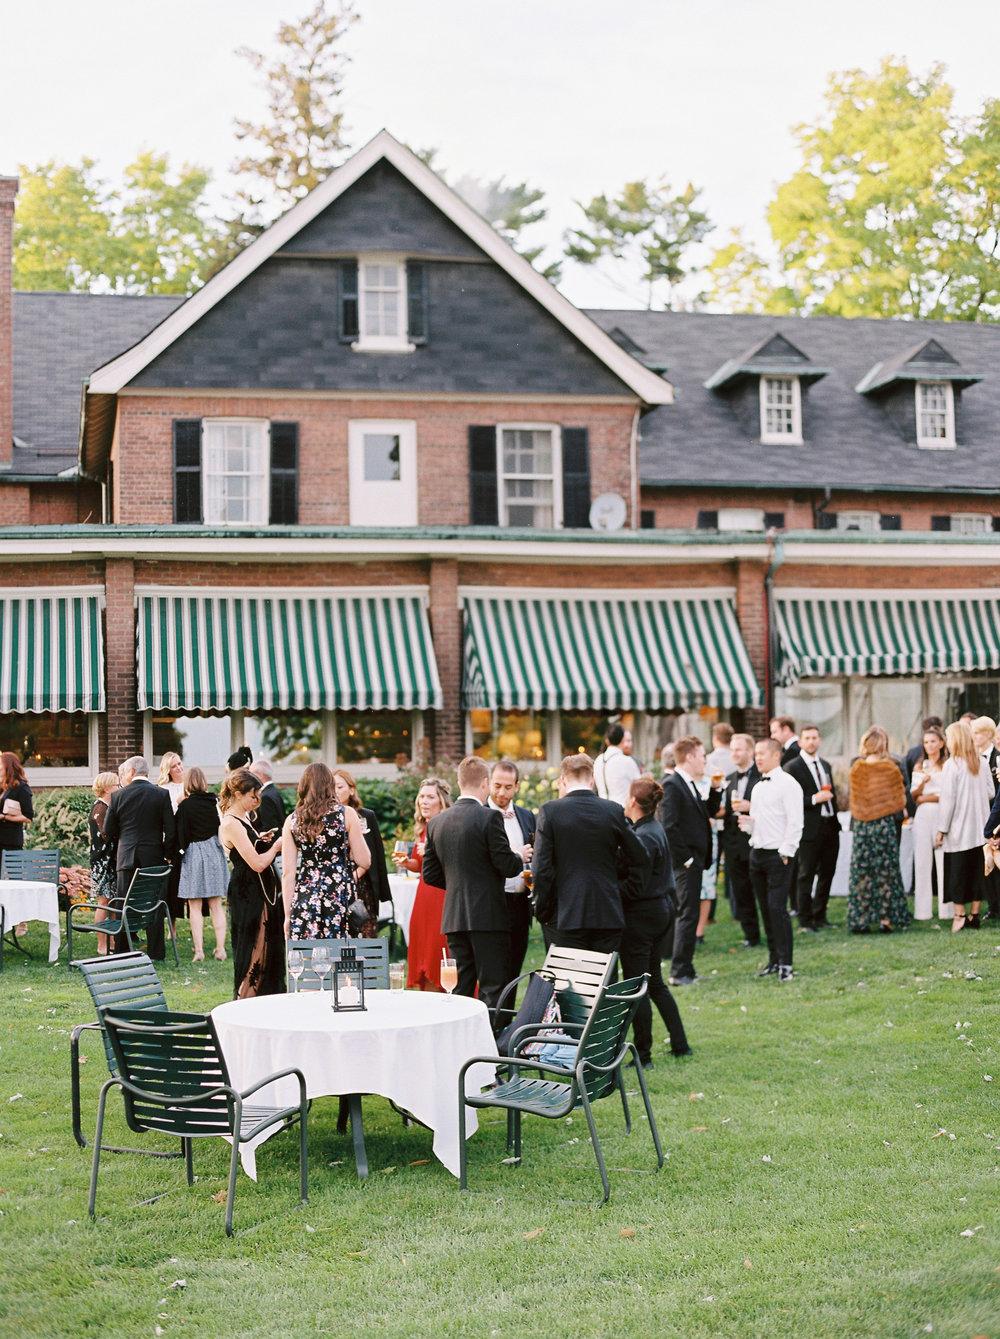 0607-Geneva-Ian-Wedding-Toronto Golf Club-When He Found Her-TorontoPhotographer.jpg